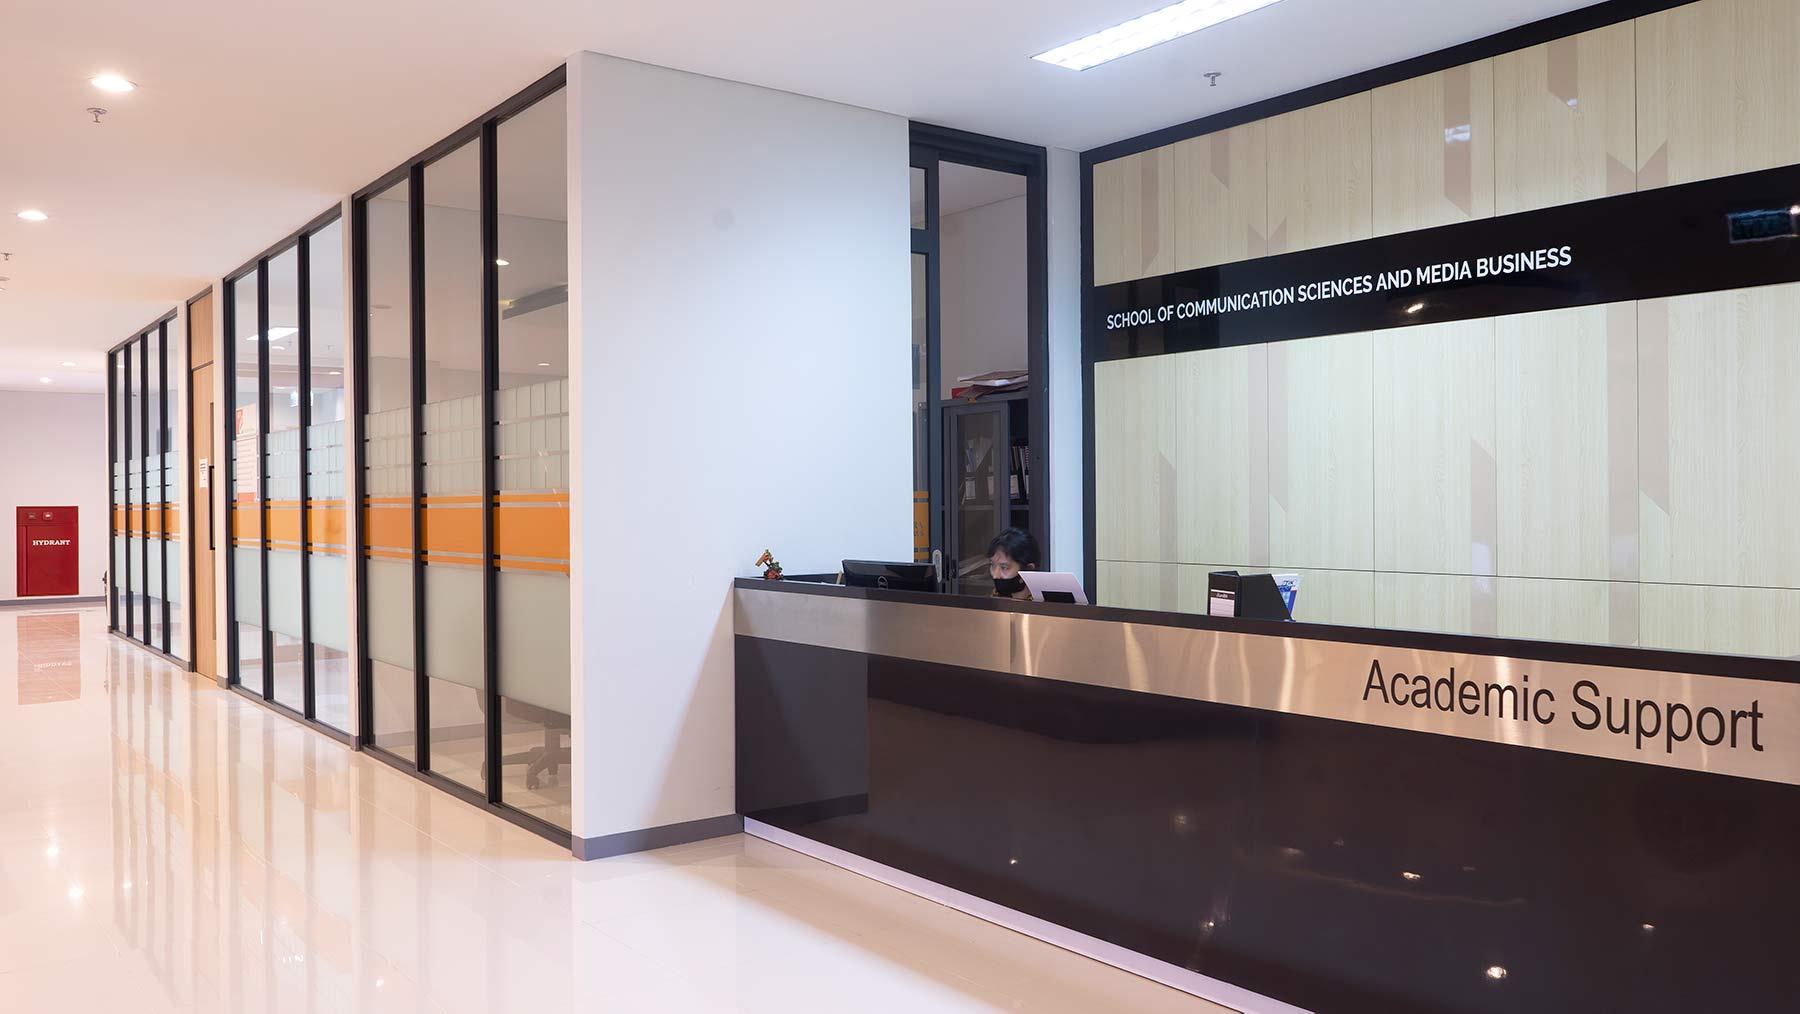 Fakultas Ilmu Komunikasi - School of Communication Facilities